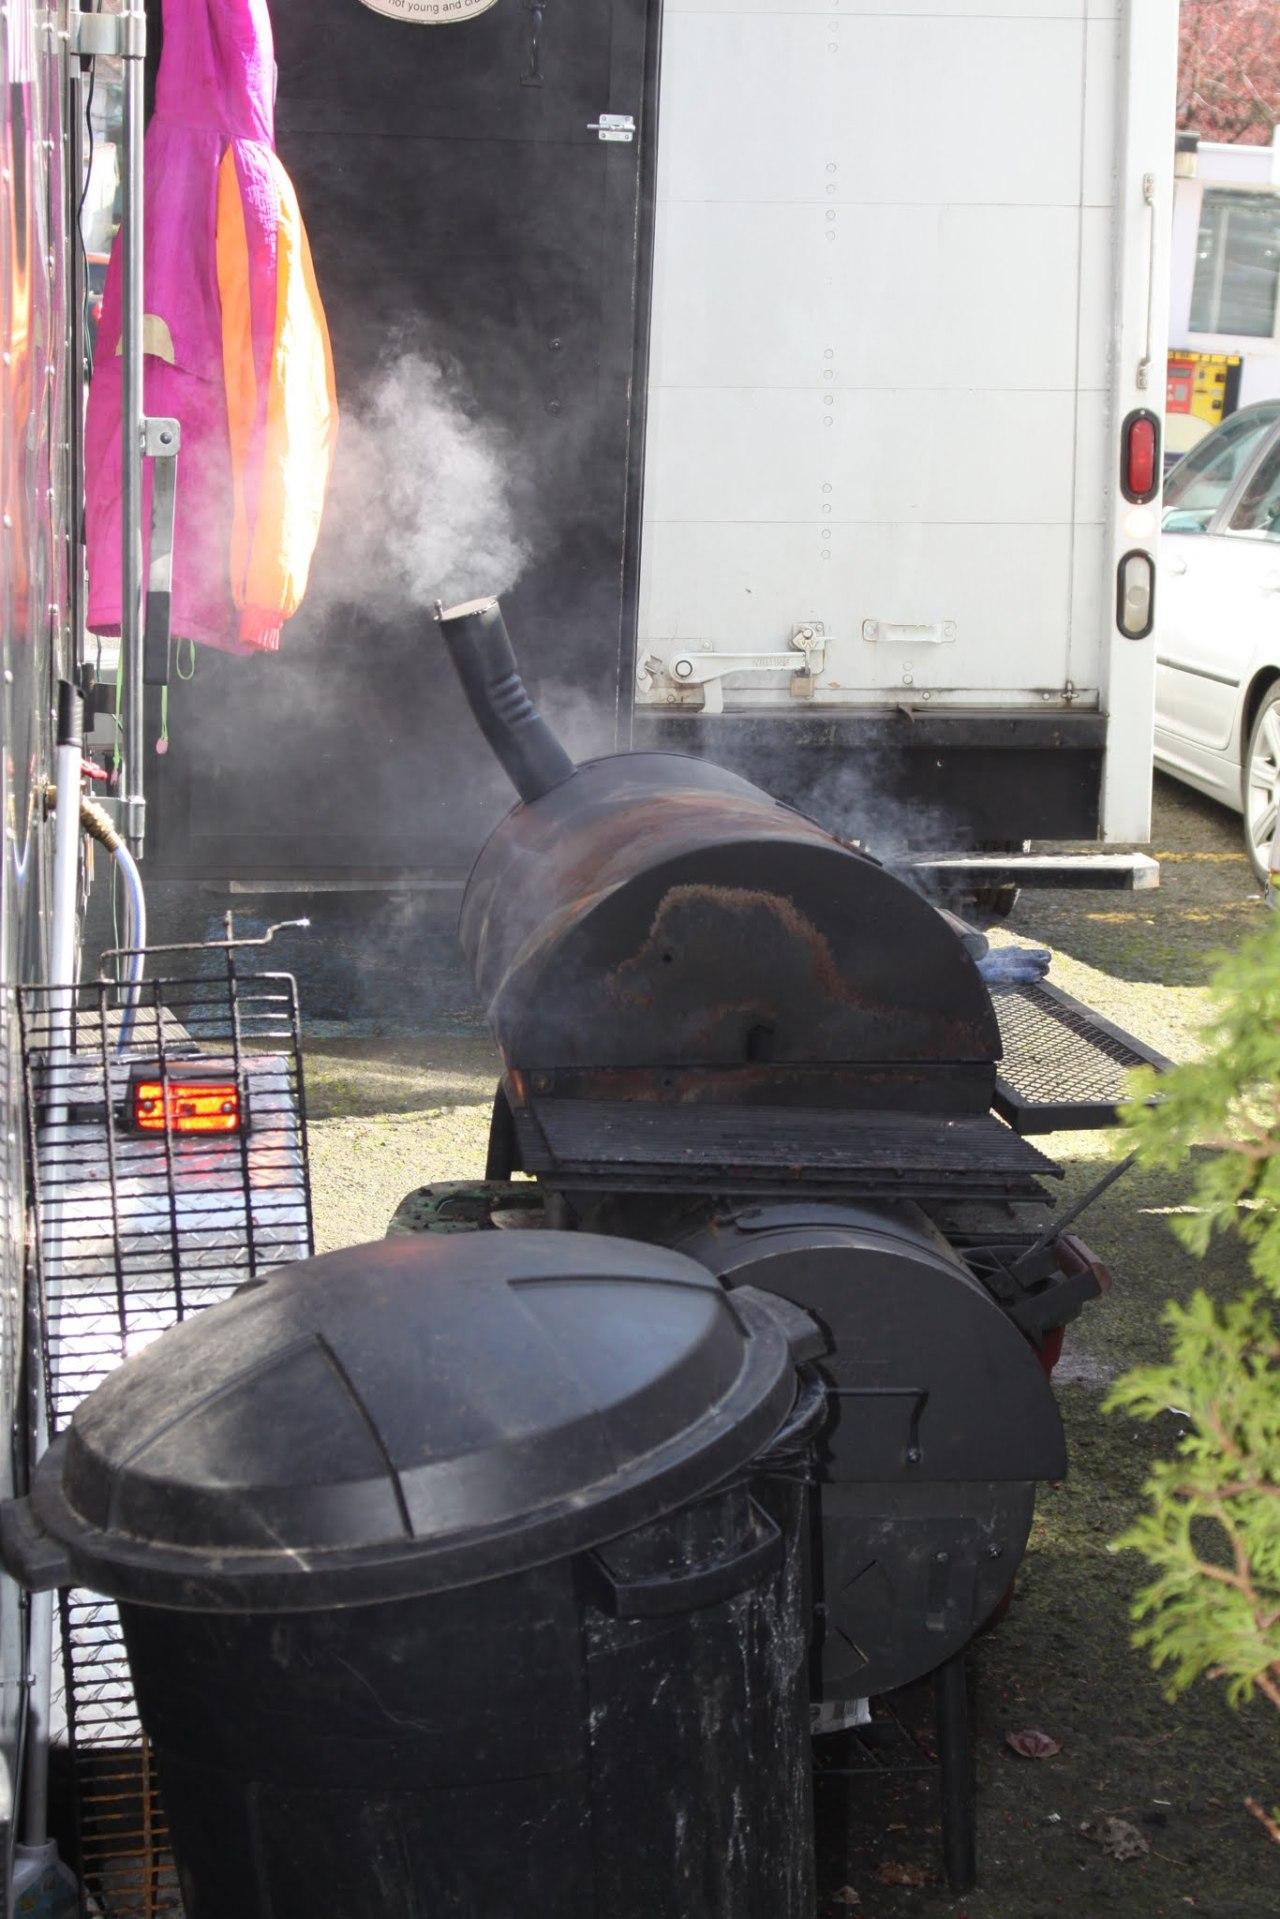 Outdoor BBQ  whats missing Handwashing setup